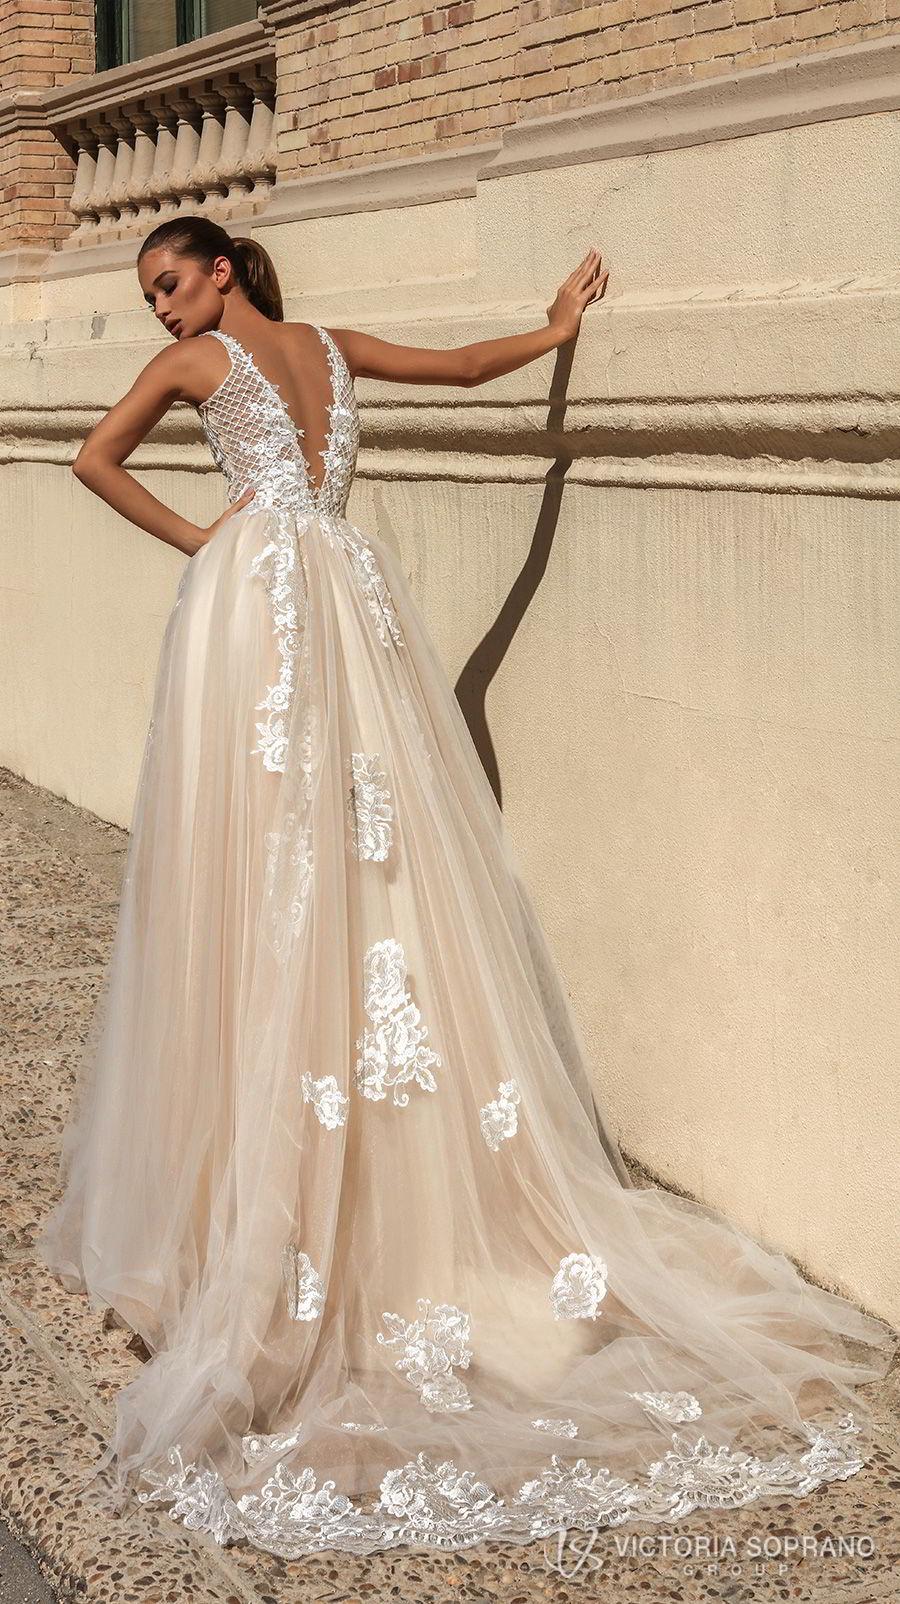 victoria soprano 2018 bridal sleeveless deep plunging v neck heavily embellished bodice romantic sexy champagne color a  line wedding dress open v back chapel train (bella) bv